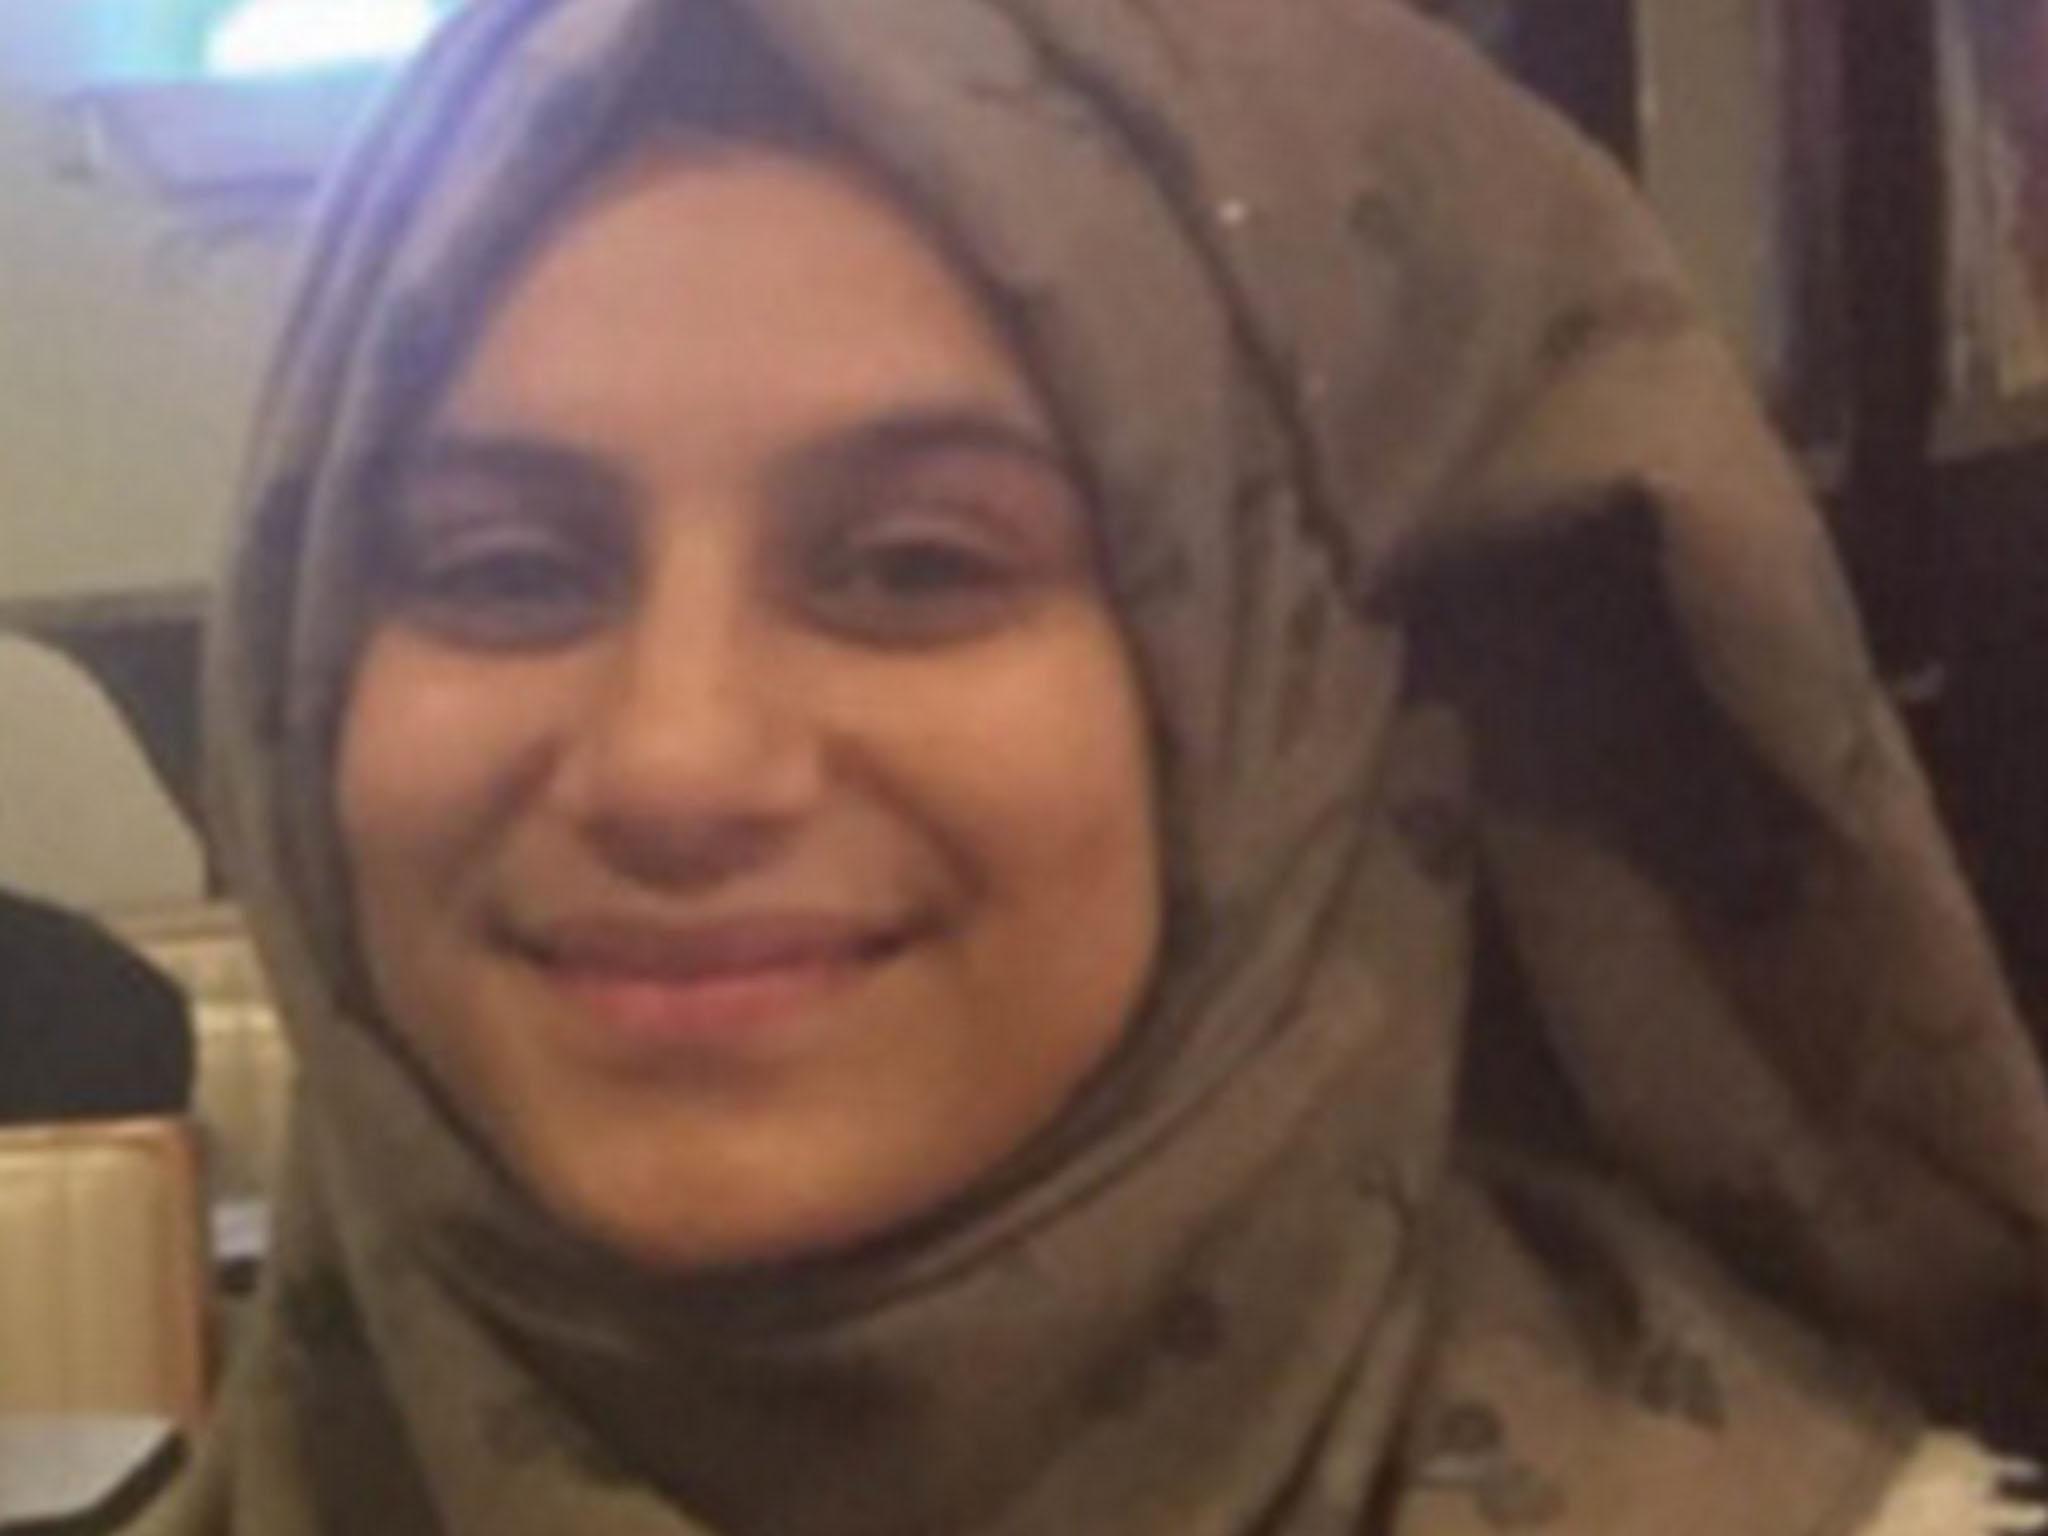 Haileys arab american teen hot babe british muslim